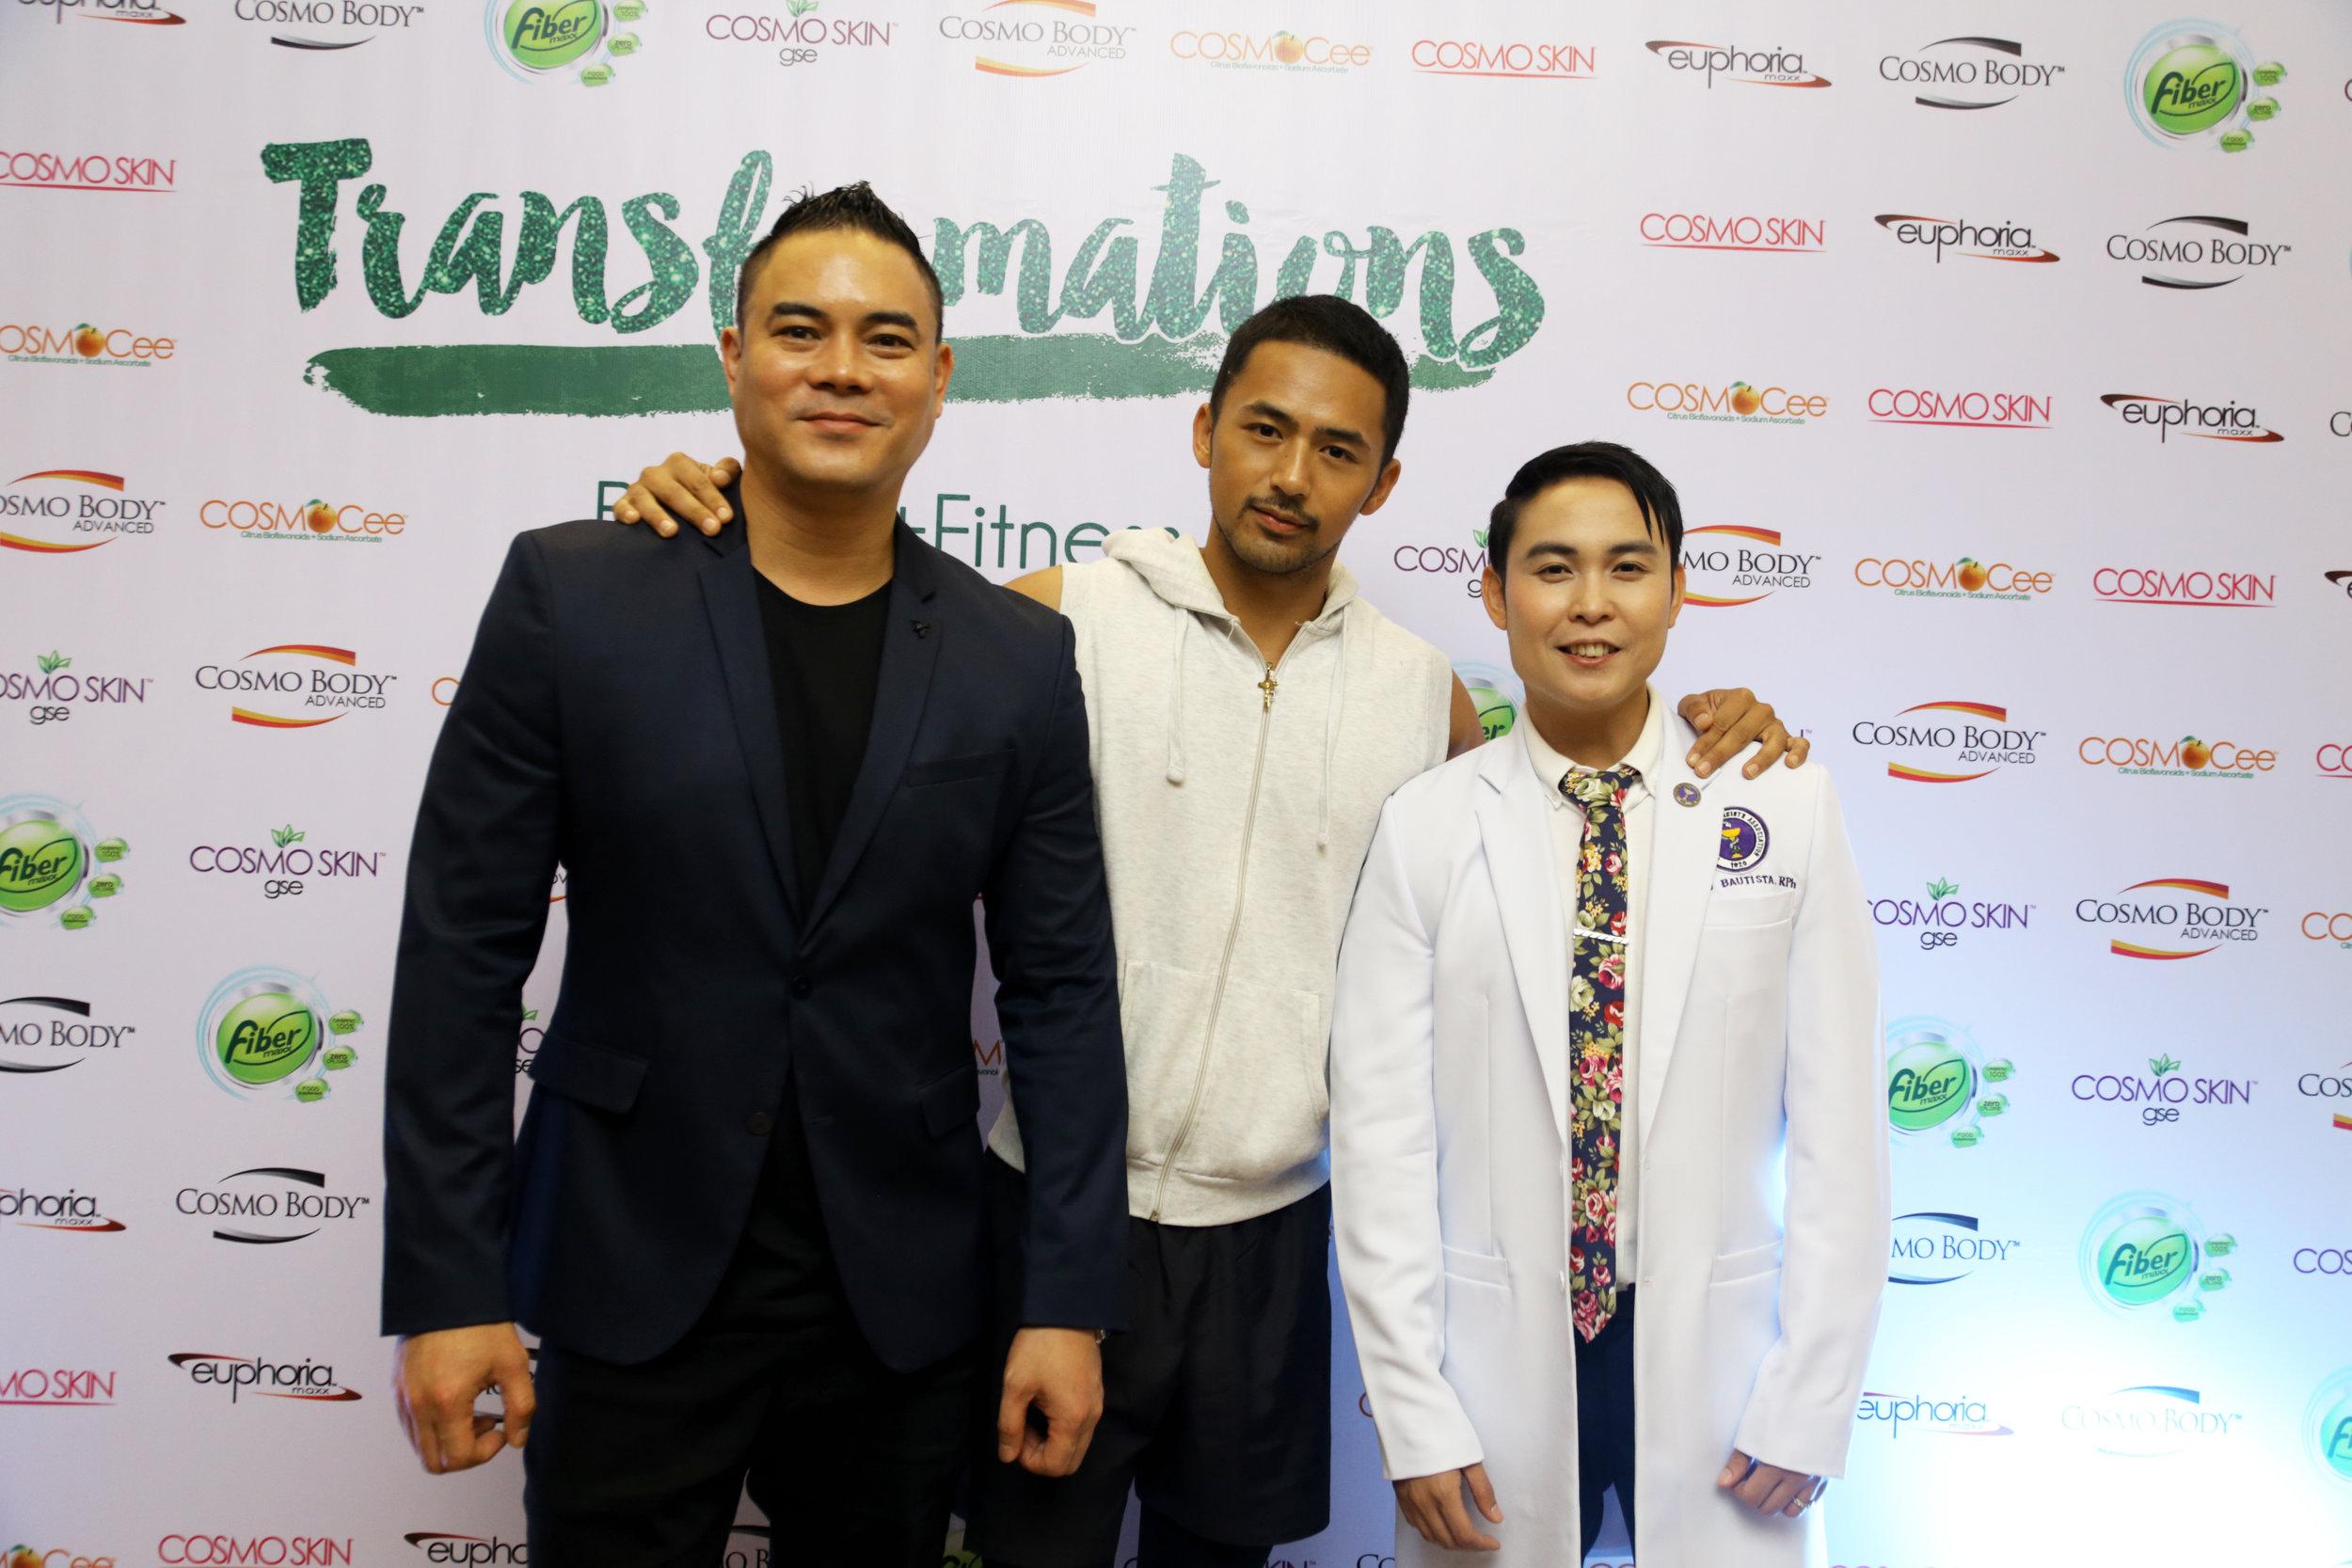 BFC's Red Gatus and Nino Bautista flank endorser and Kapamilya star Enzo Pineda